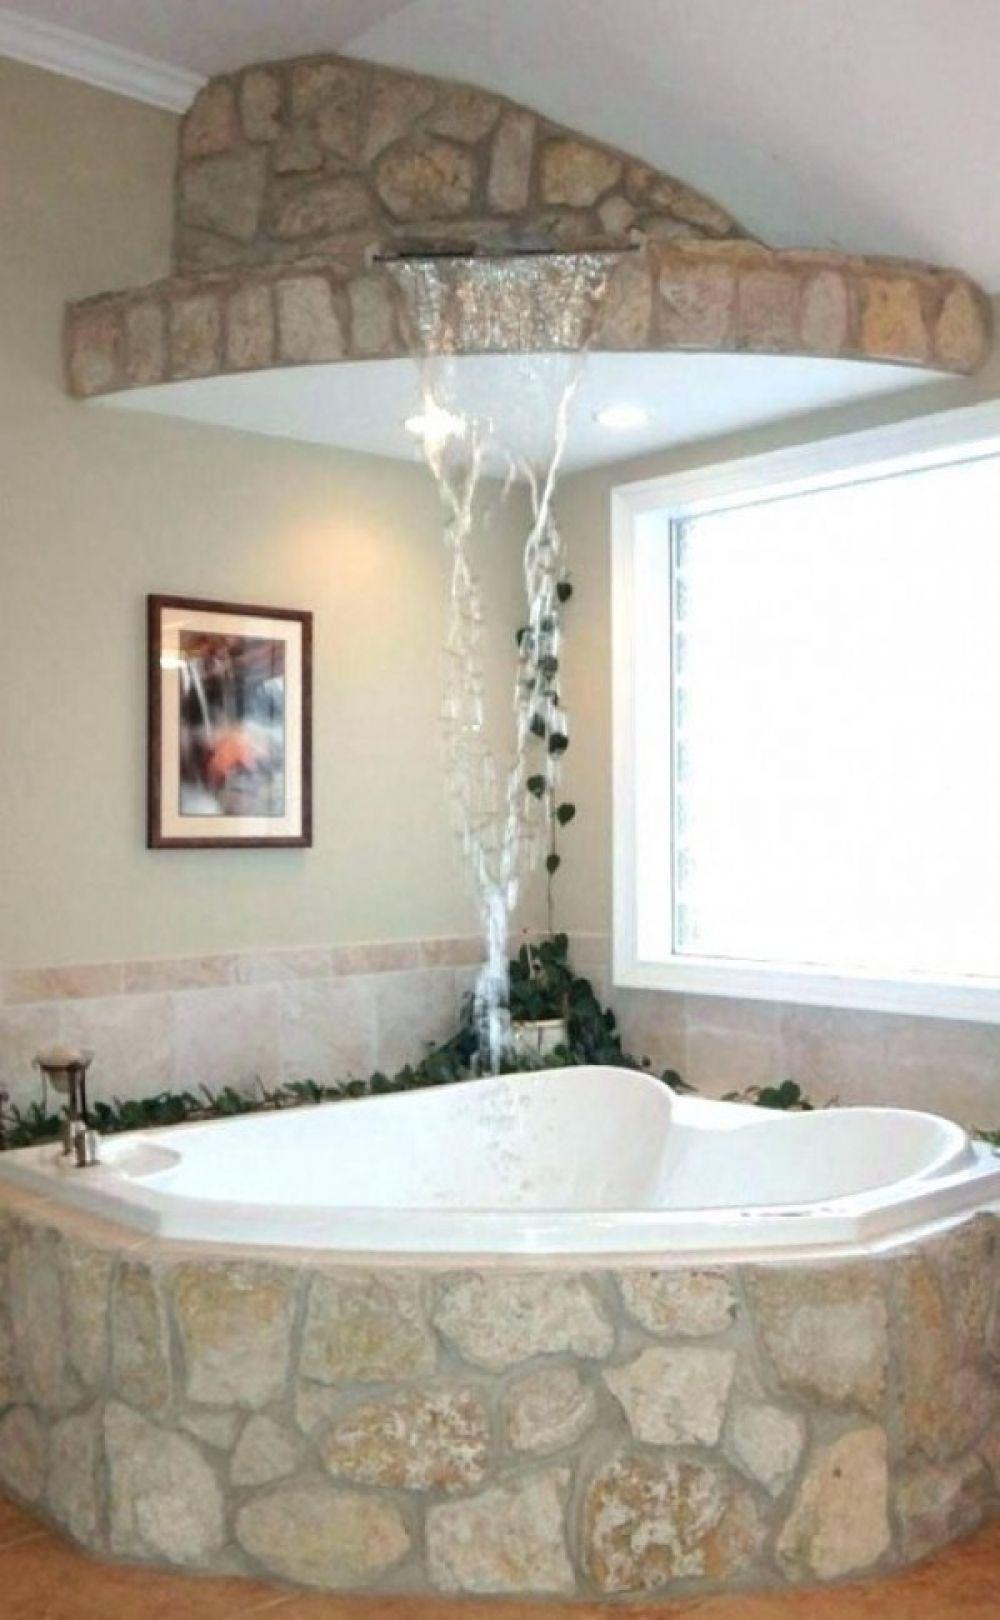 Standing Glass Shower Bathtub Bathroom Design Bathtub Shower